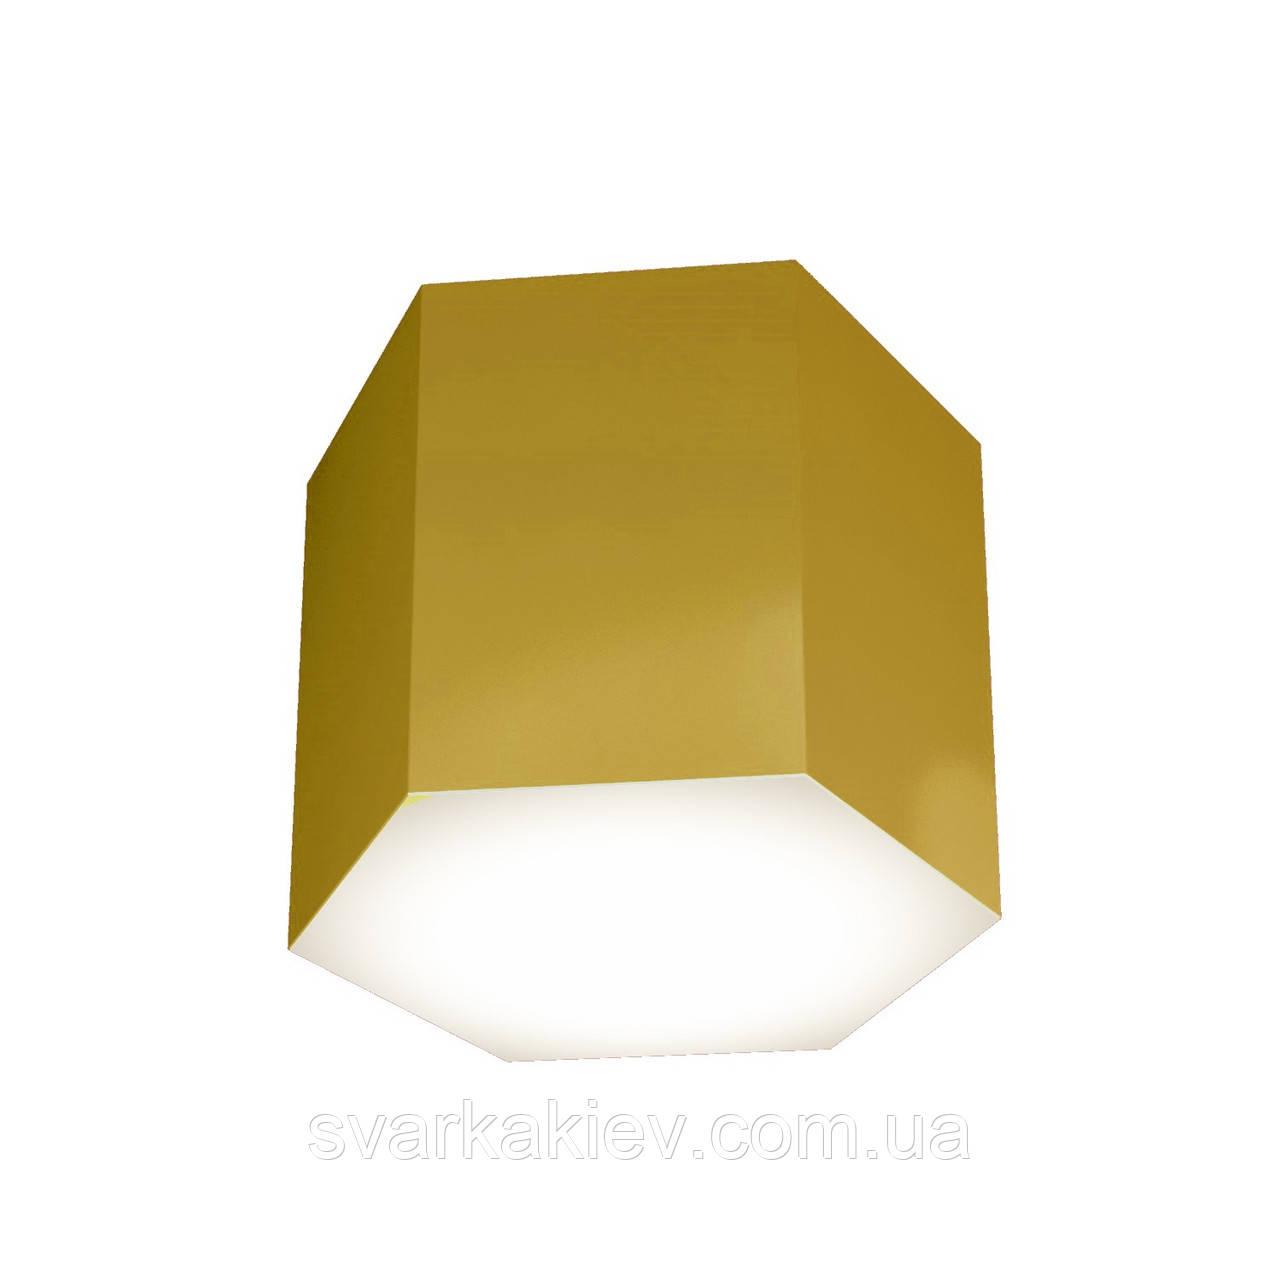 LED светильник потолочный Ceiling Lamp Cleo 15W L GL